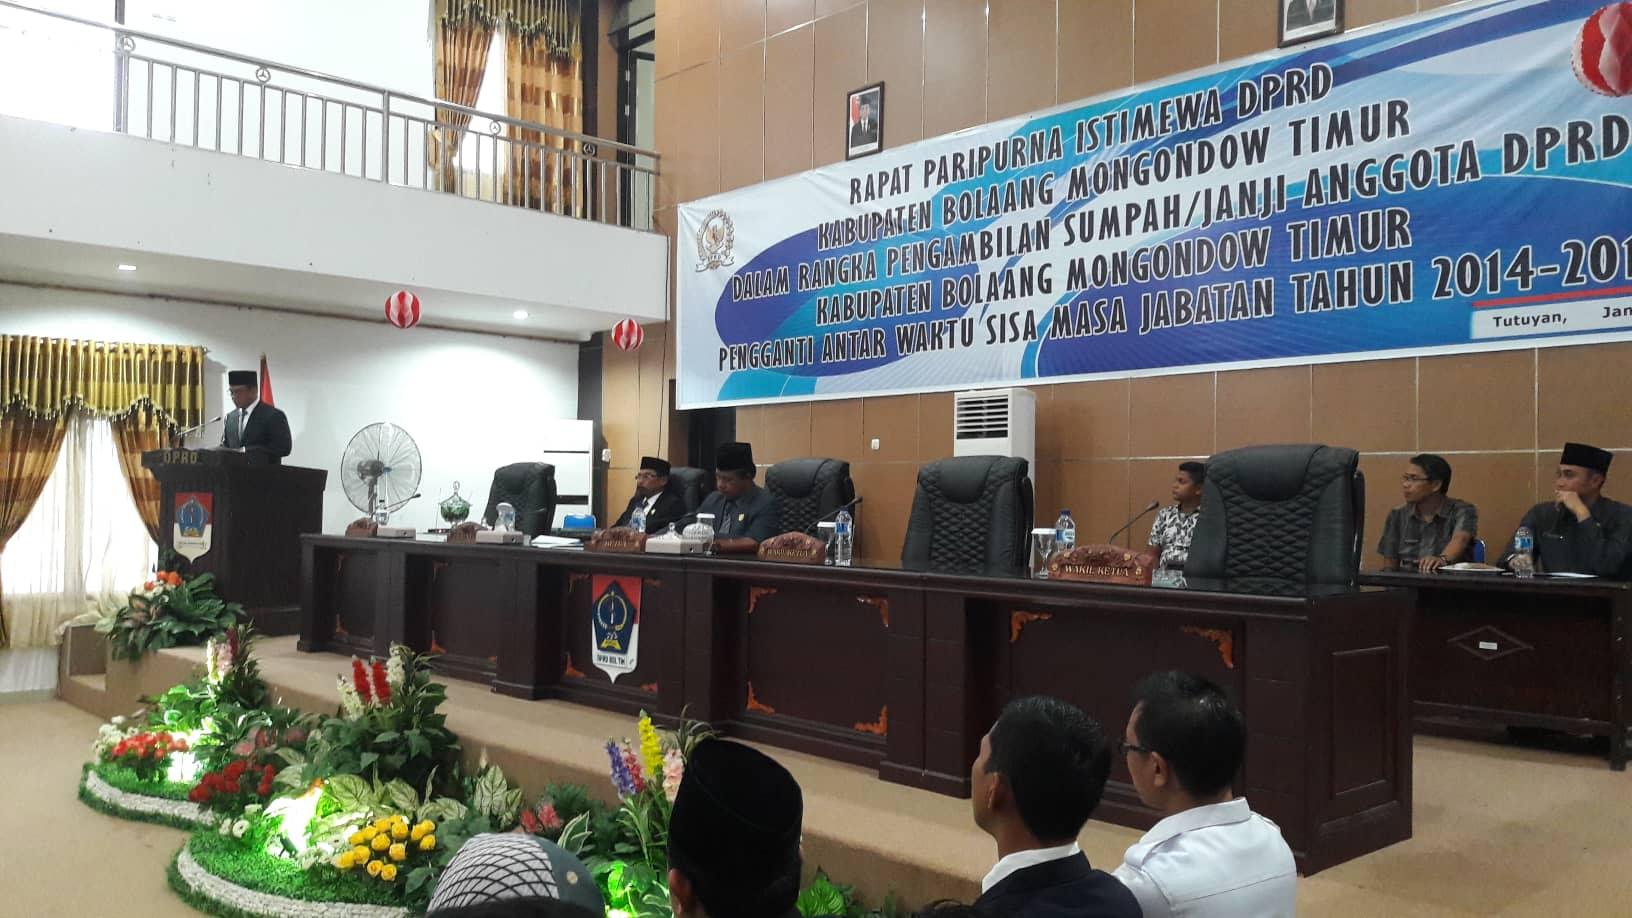 DPRD Boltim Gelar Pelantikan PAW Dua Anggota Dewan